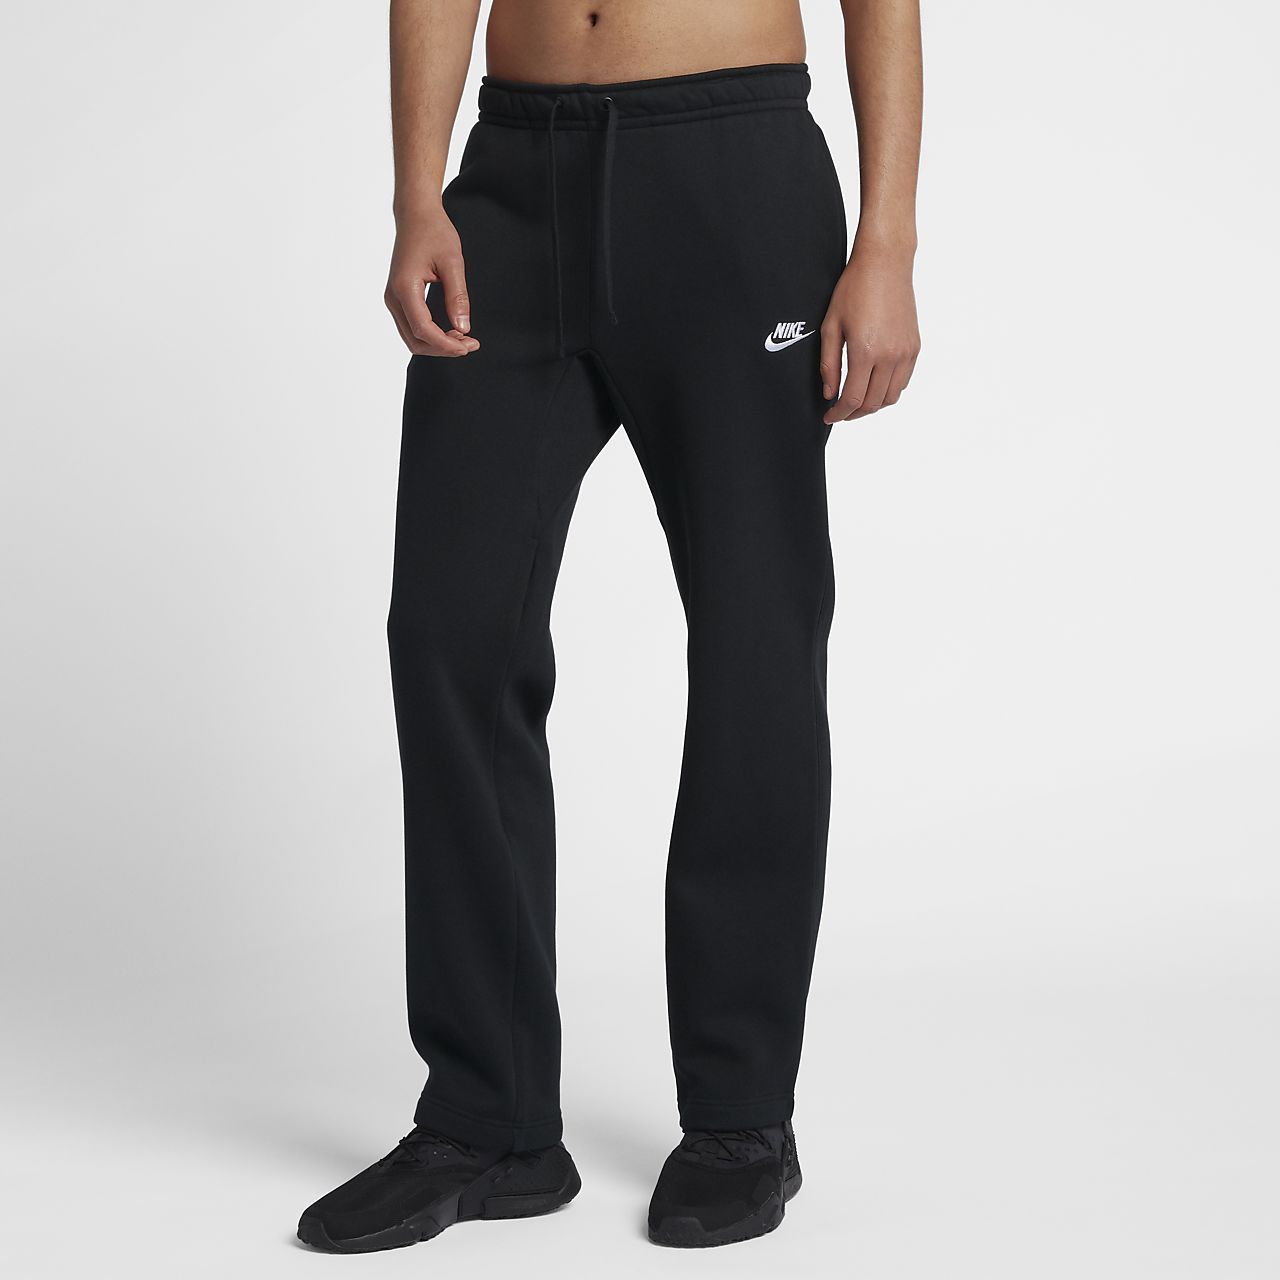 Nike Men's Team Club Fleece Pant NWT